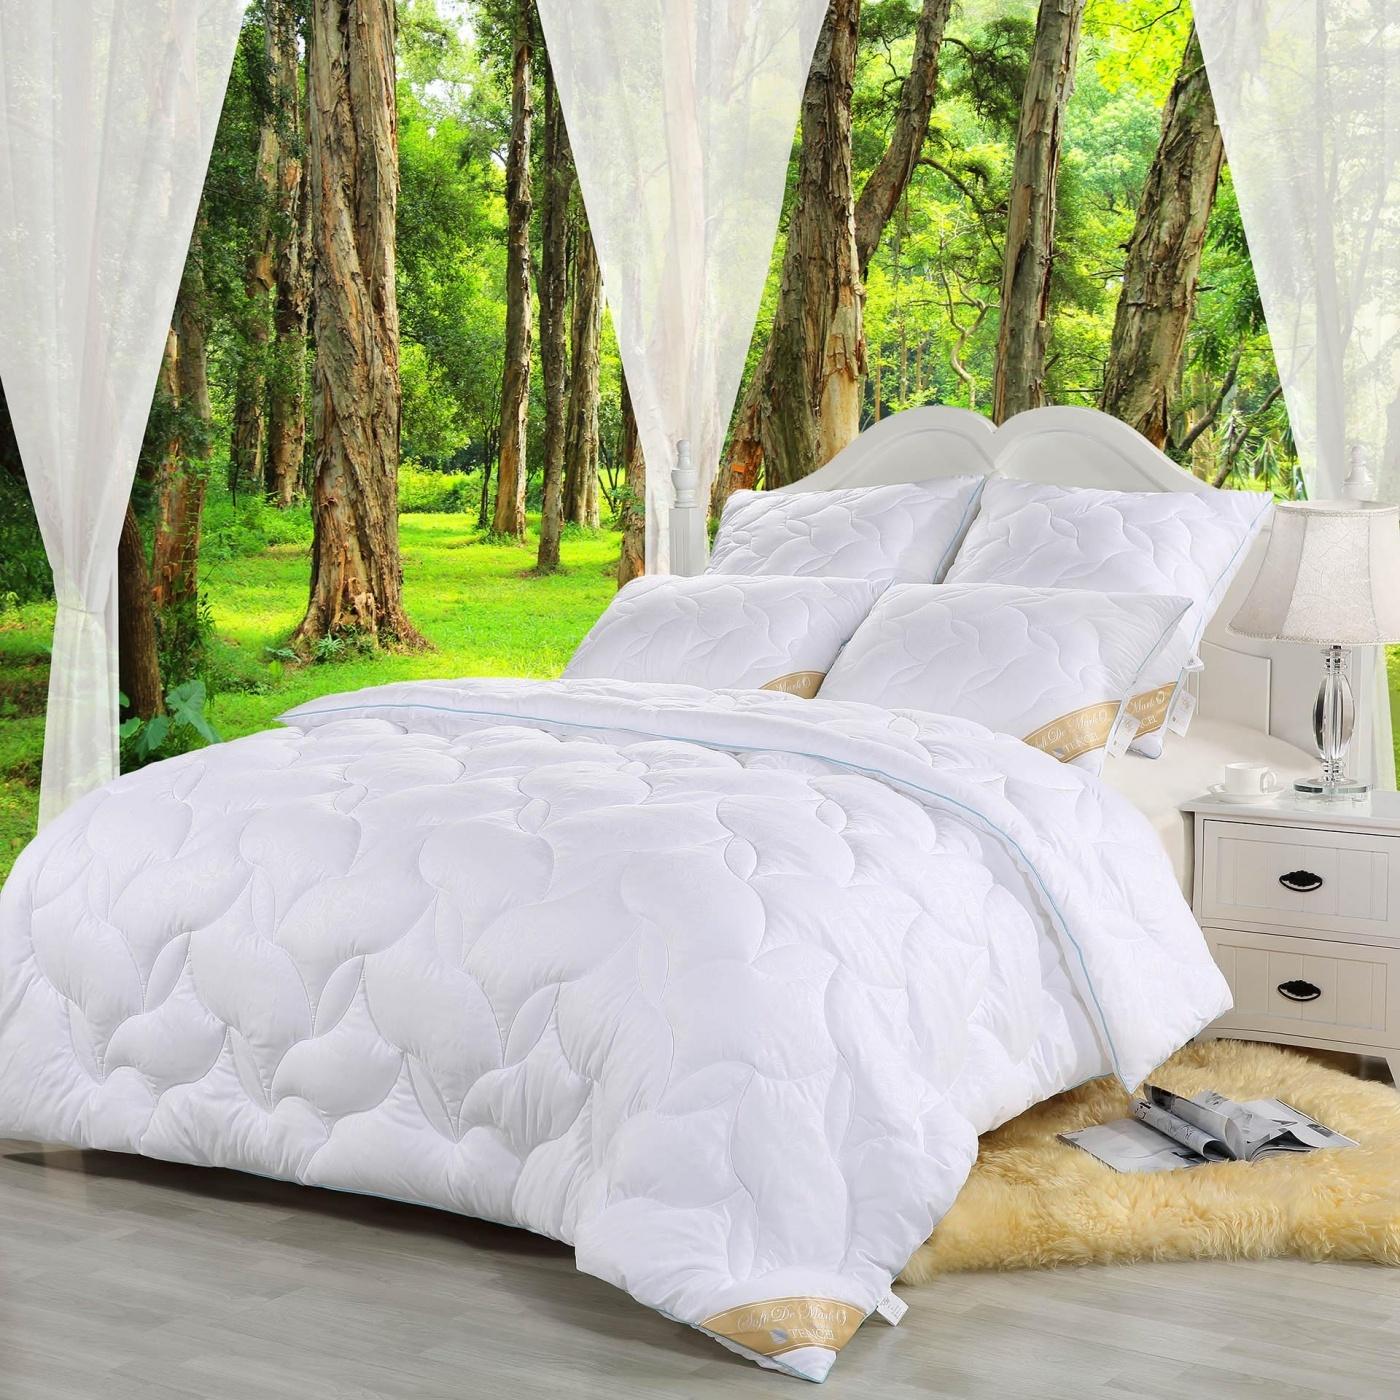 Одеяло Легкое Kerr (195х215 см)